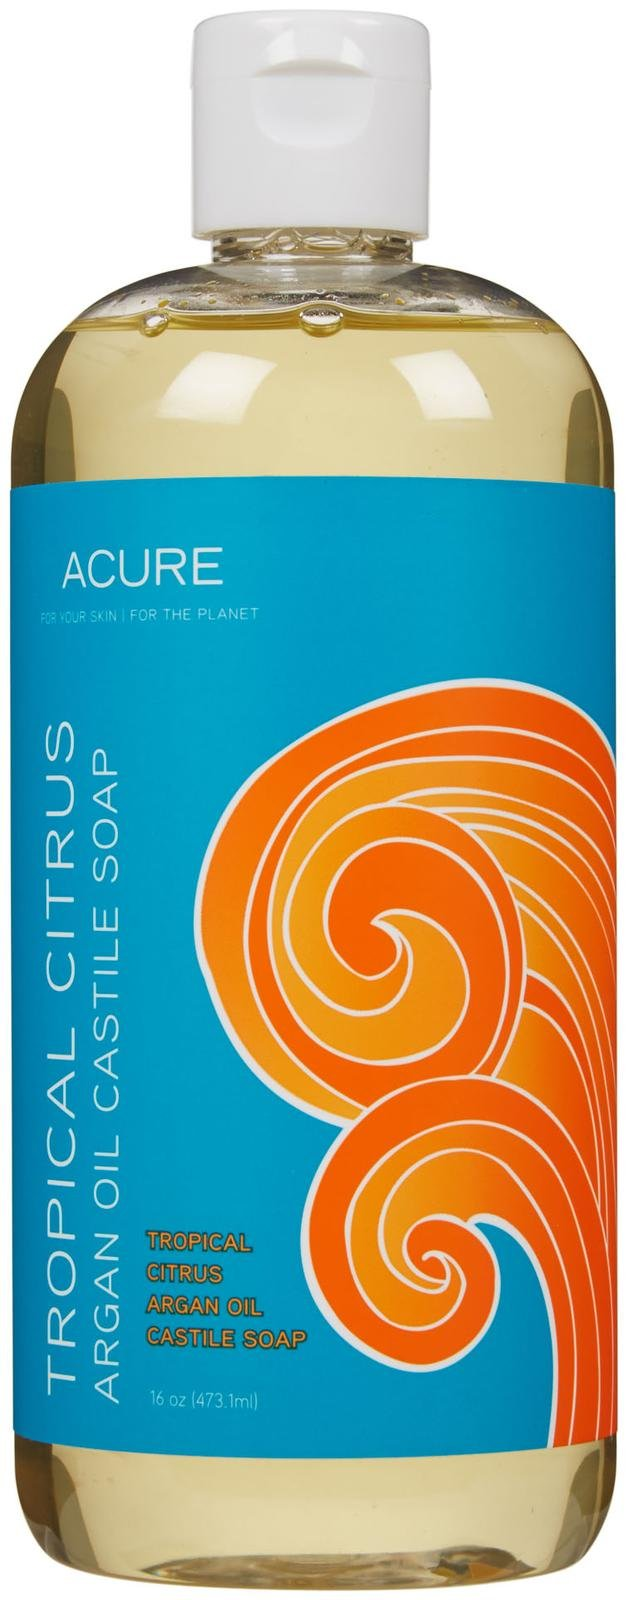 Acure Organics Argan Oil Castile Soap Tropical Citrus - 16 fl oz - Vegan